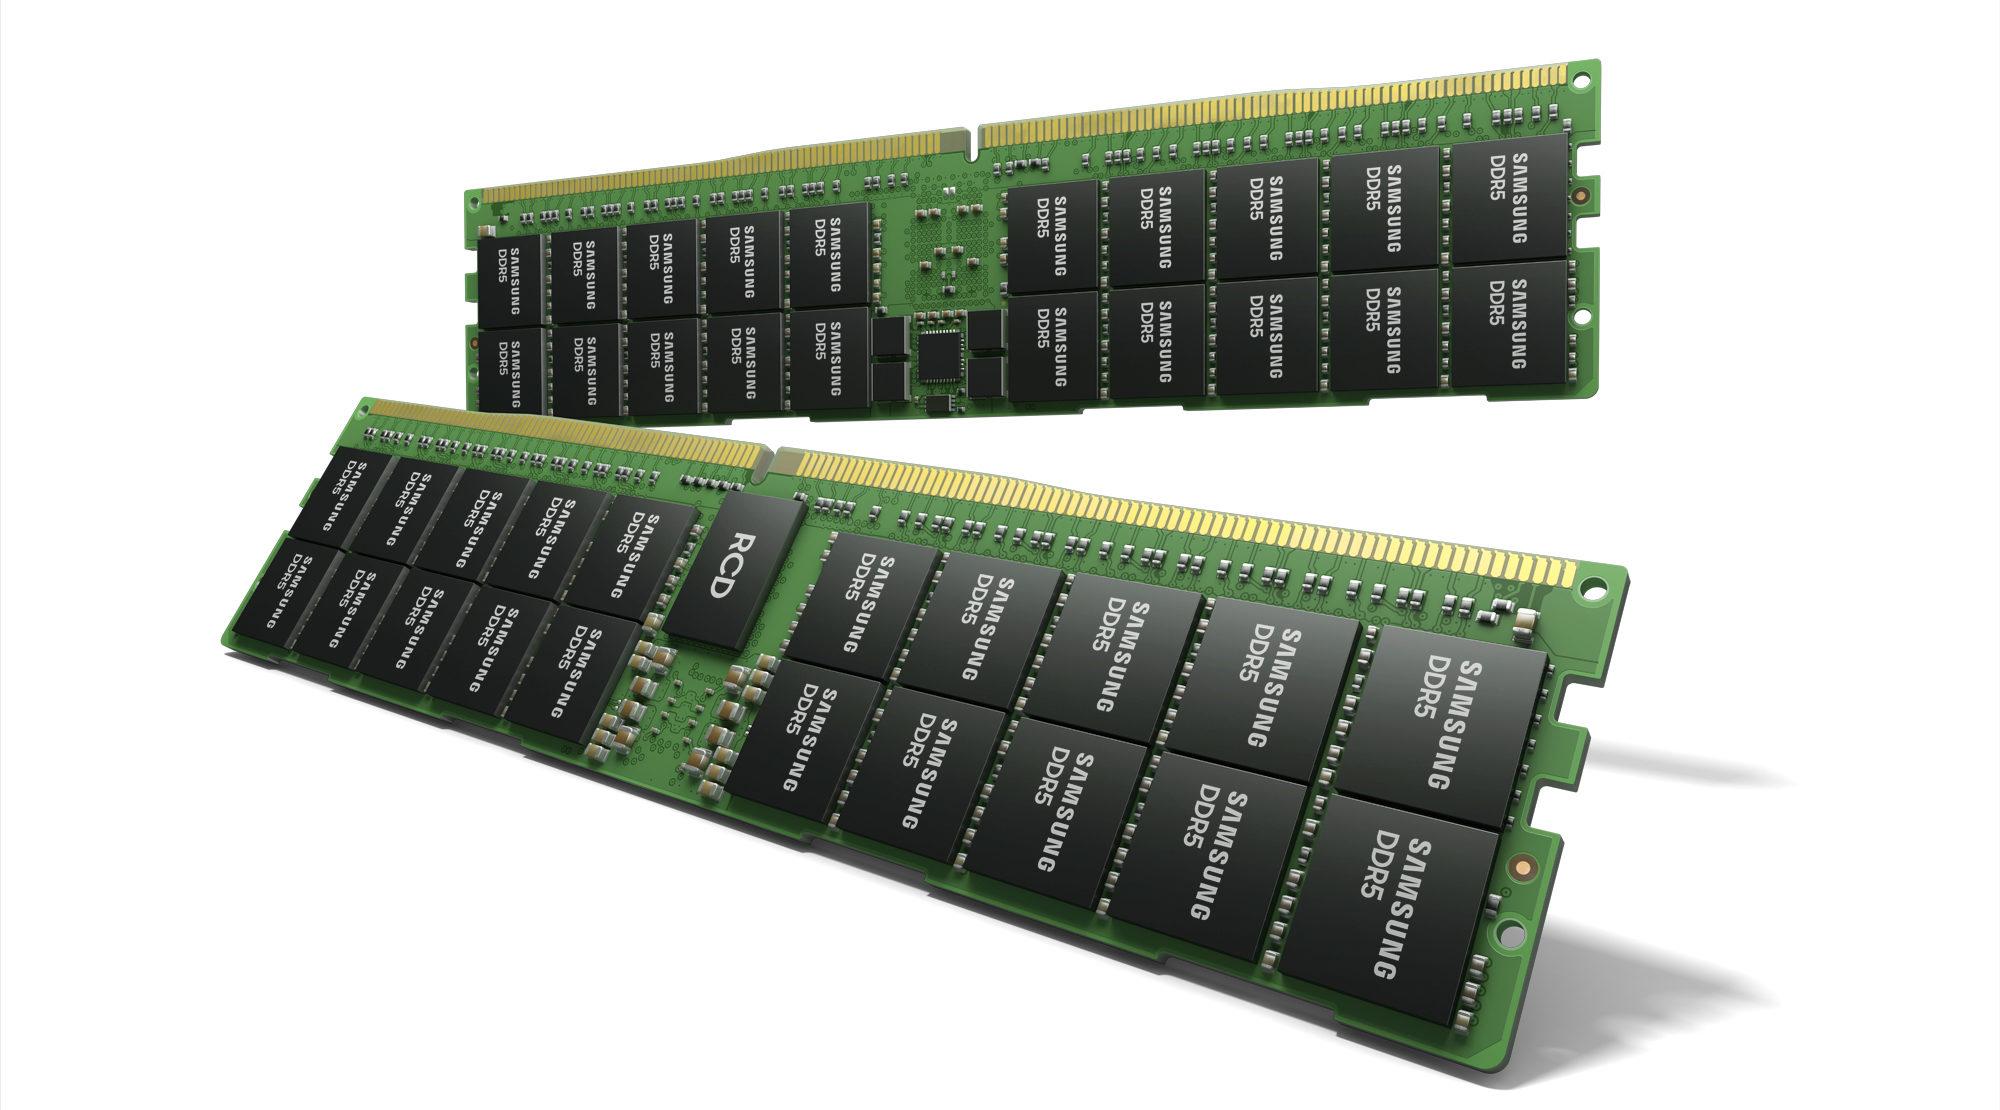 Samsung develops 512GB DDR5 memory based on High-K Metal Gate HKMG process technology – VideoCardz.com